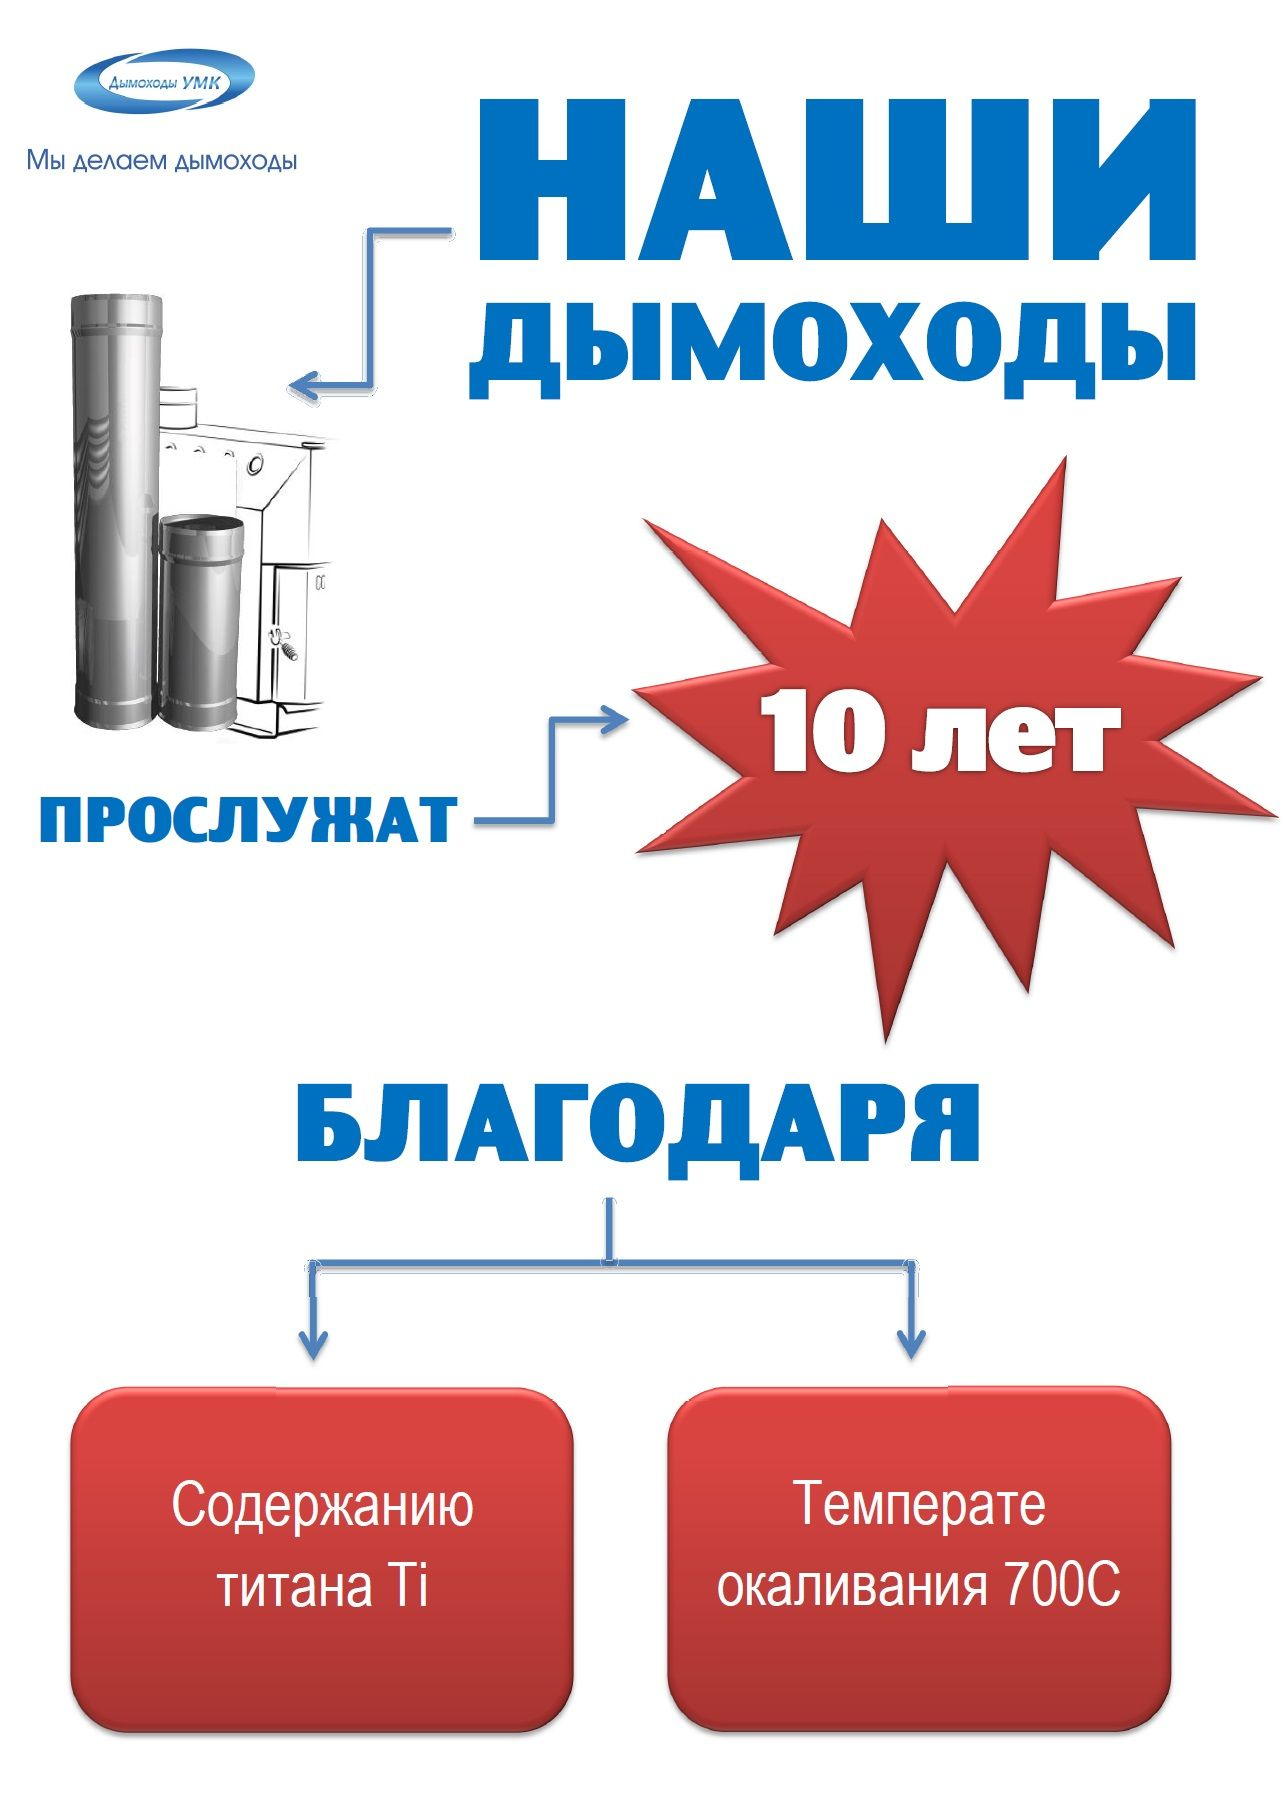 Наклейка на дымоход - дизайнер k-hak